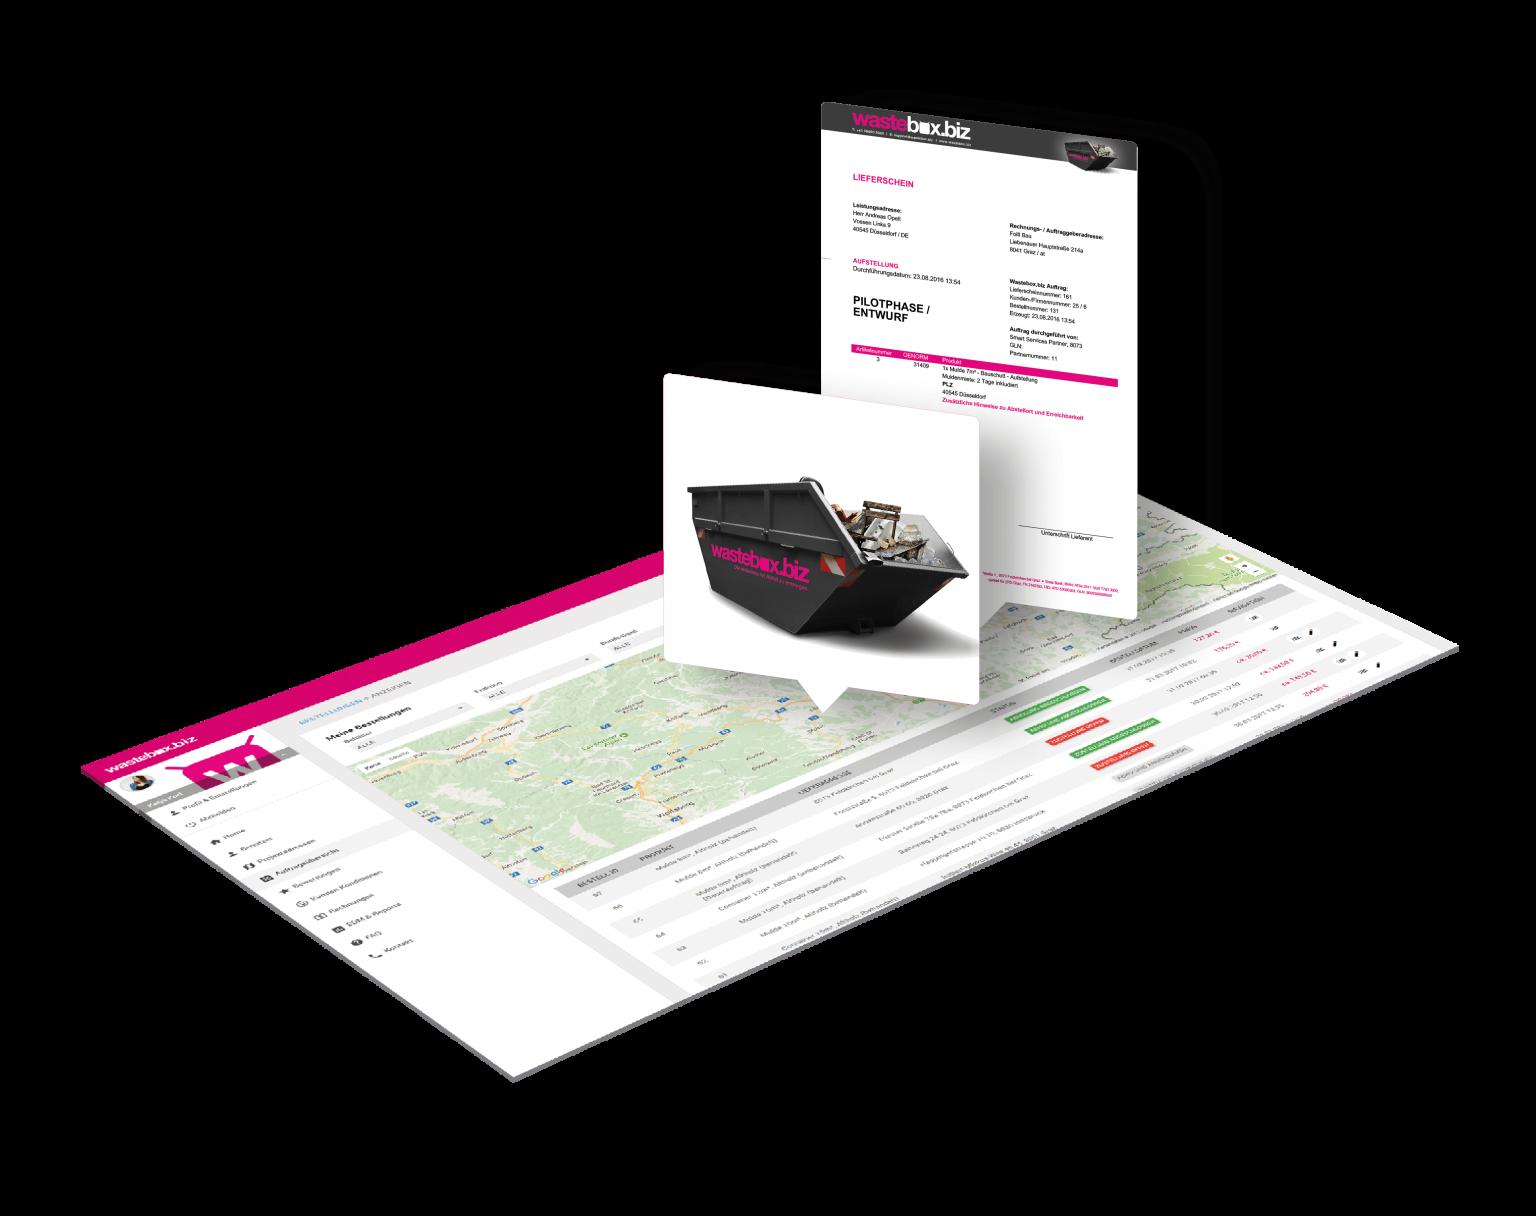 job overview - wastebox.biz web portal